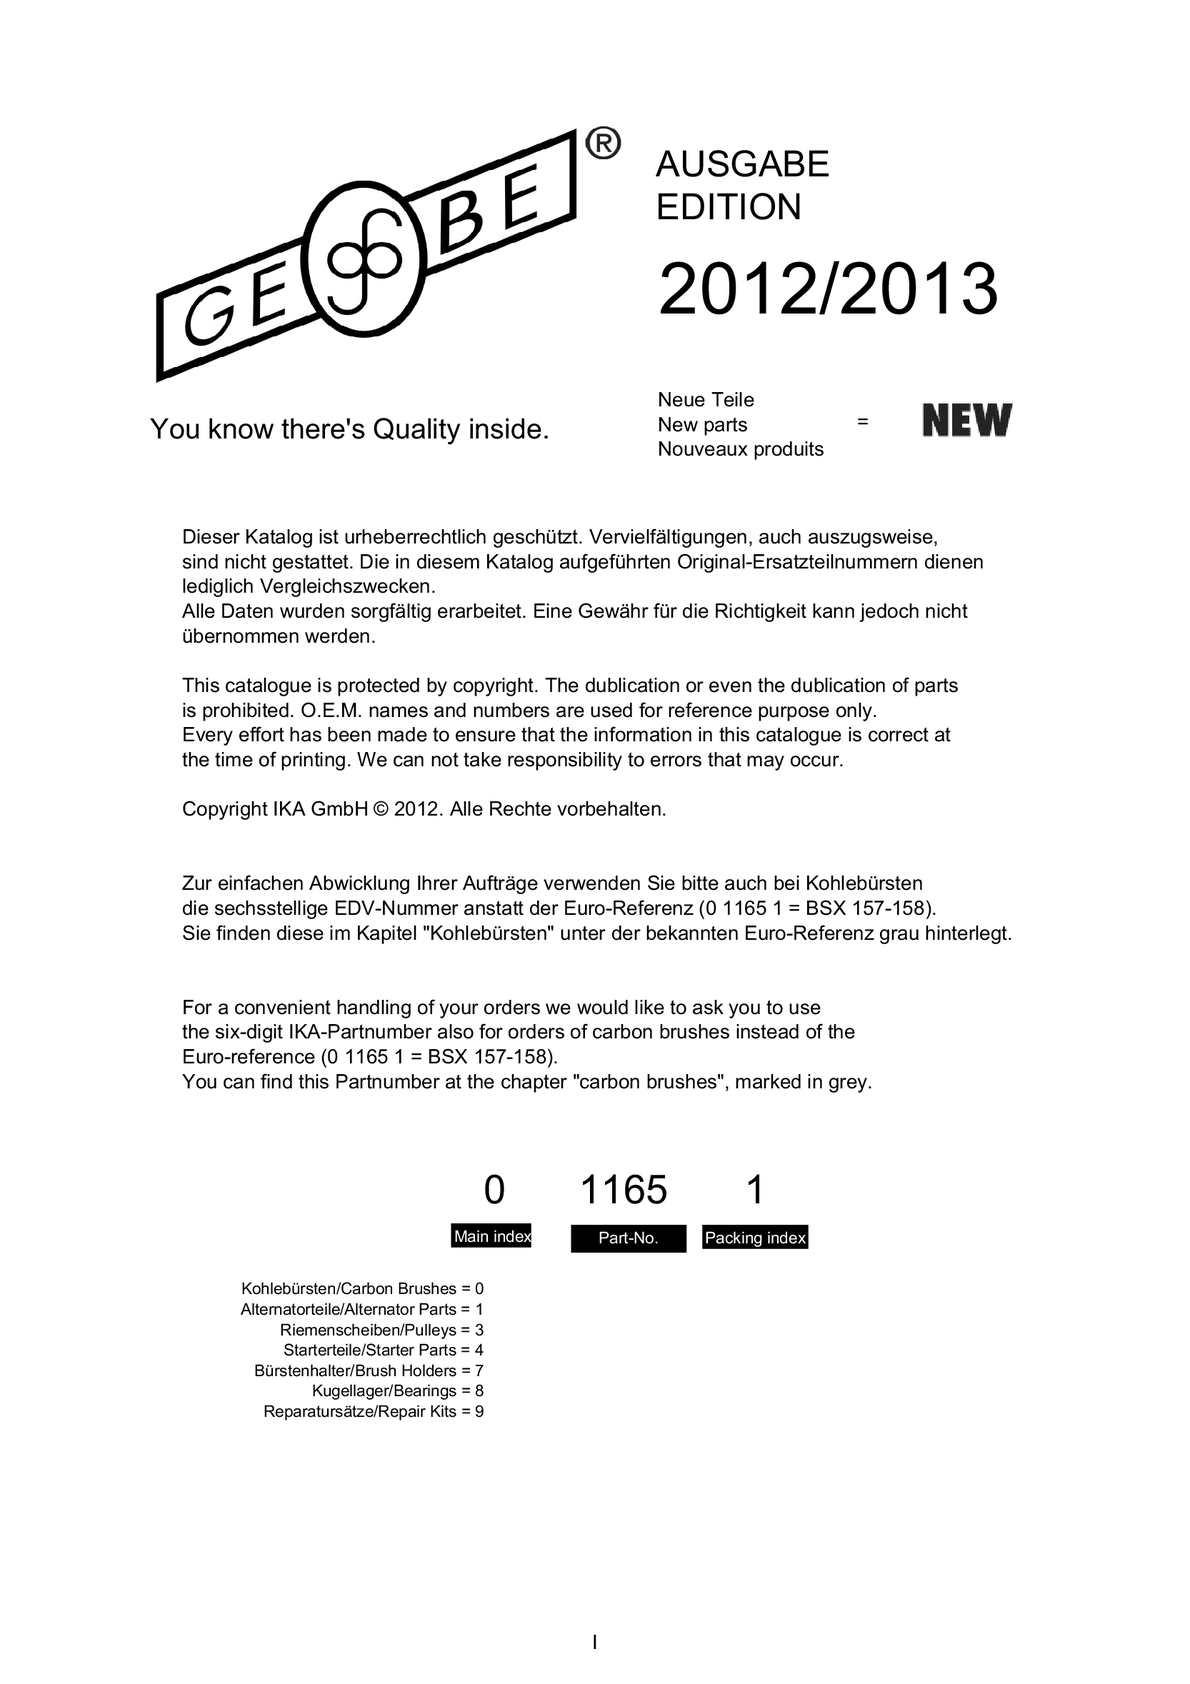 BOSCH Carbon Brush alternator 6 033 RD7 001